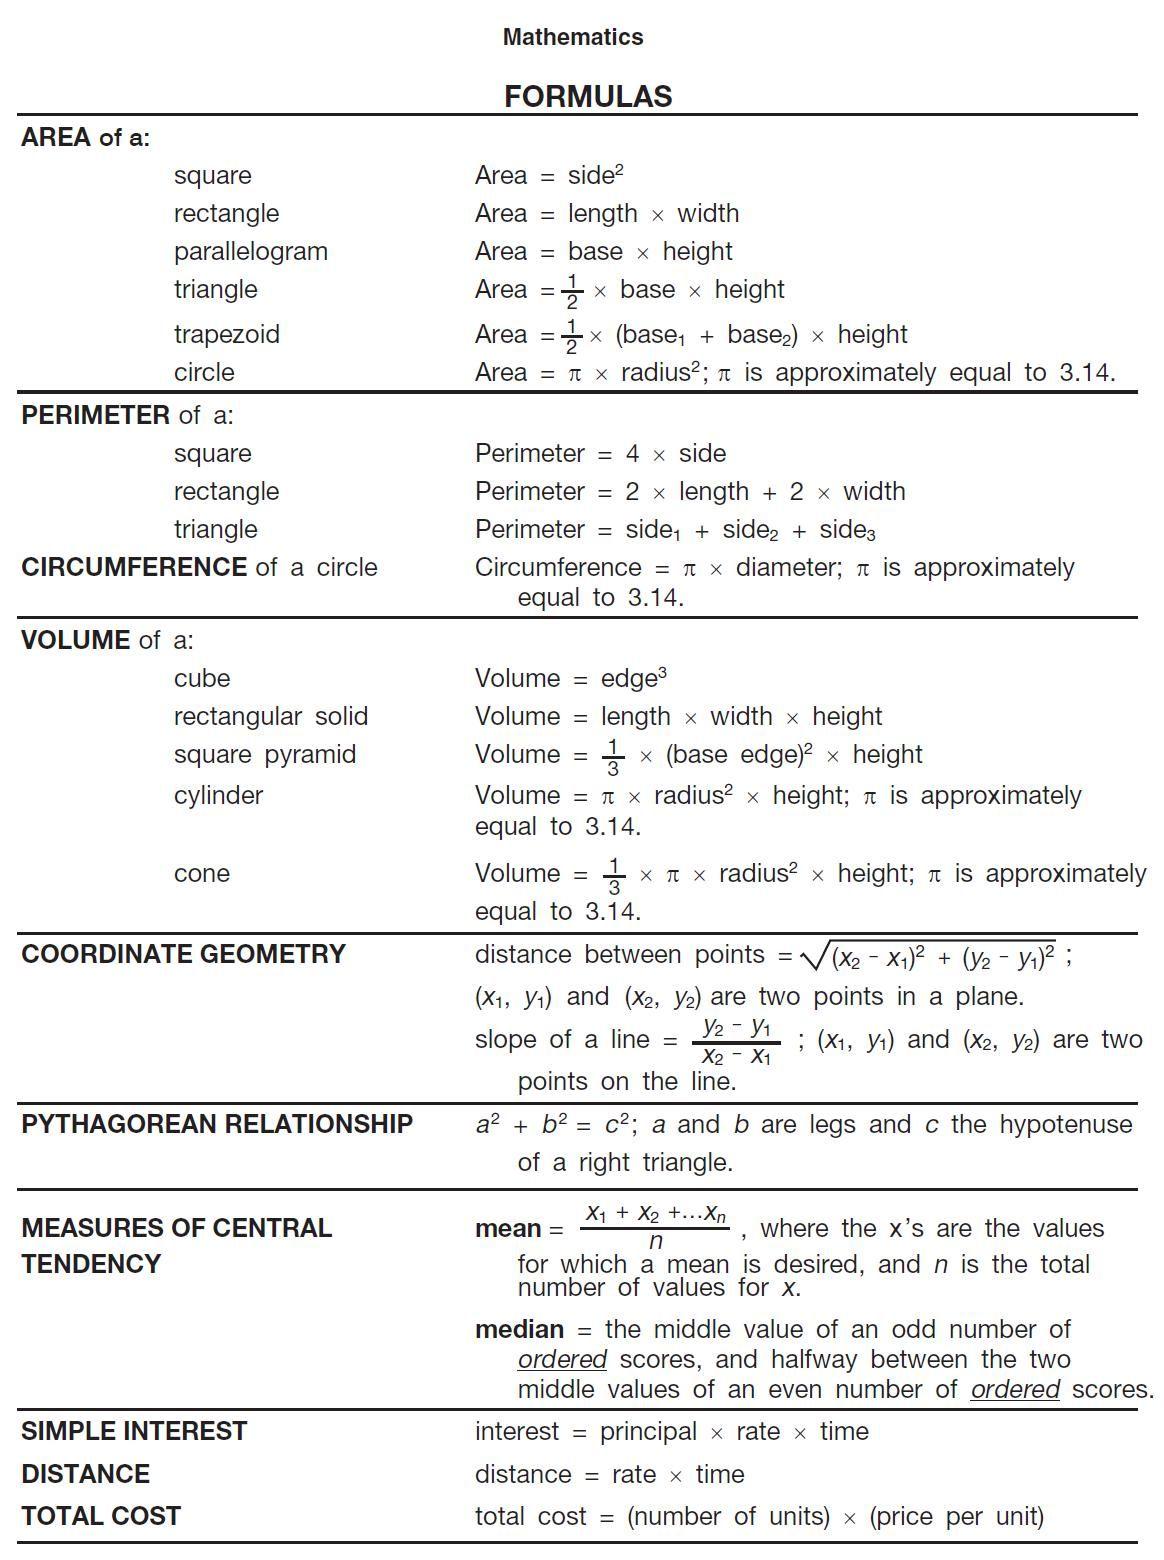 Printable Math Formula Sheet